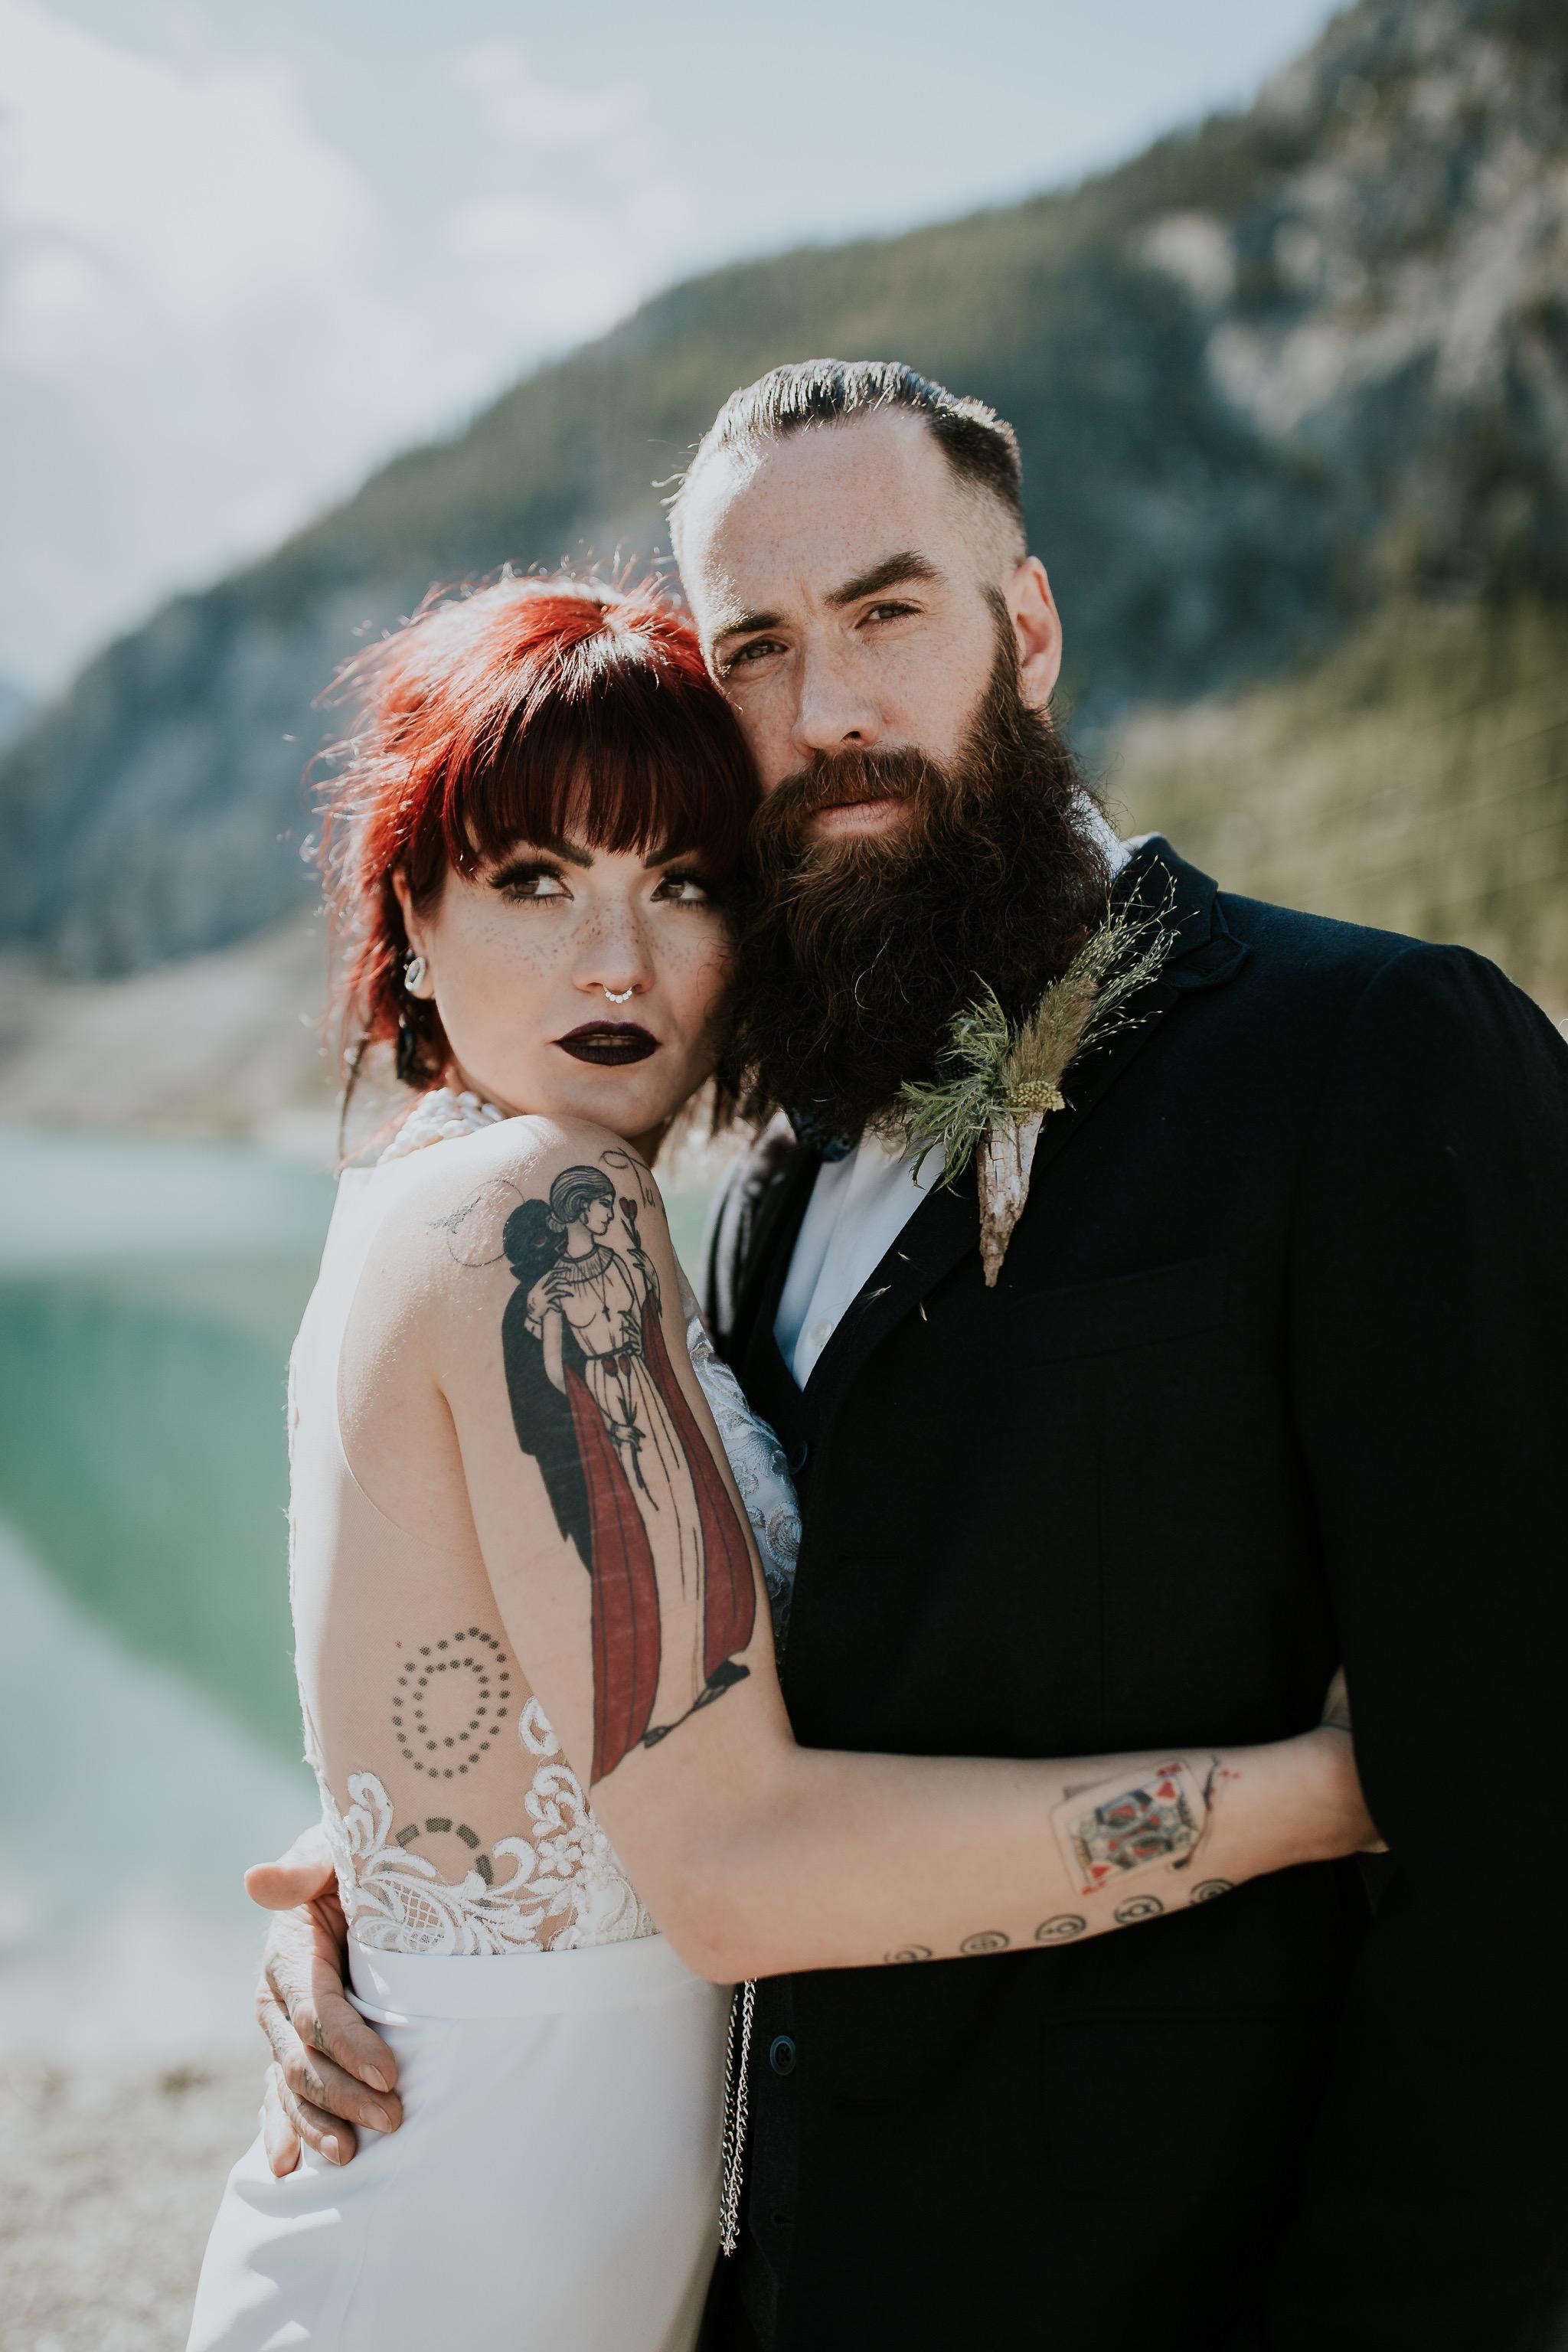 20170915-canmore-moody-wedding-photographer-creekside-creeksidestyledshoot-time&fate-5433